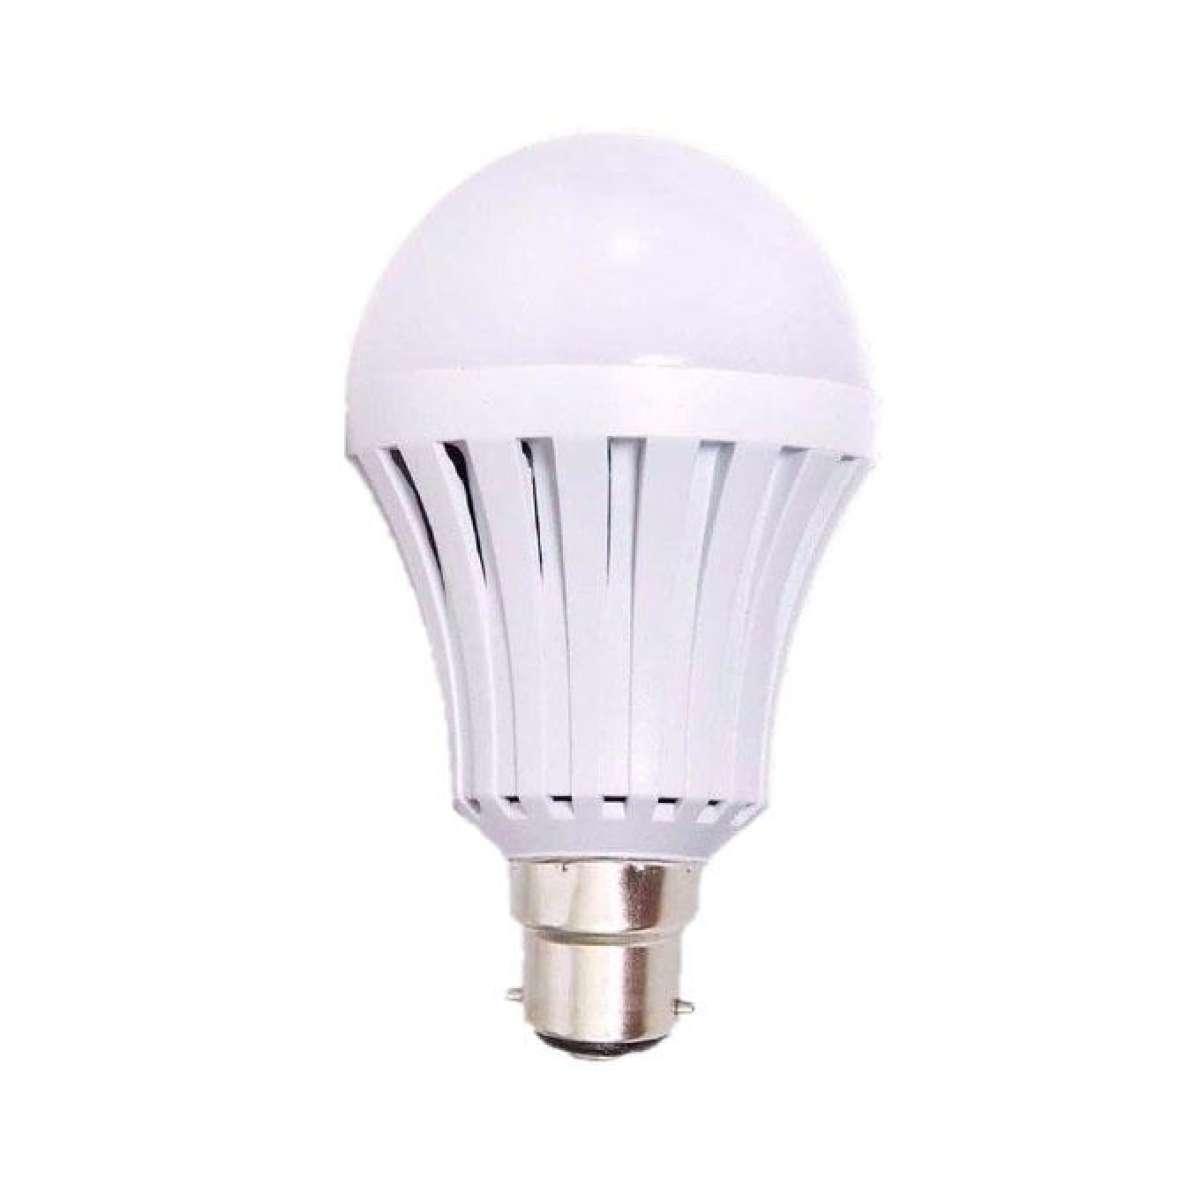 AC/DC Rechargeable LED Light 9WATT - White